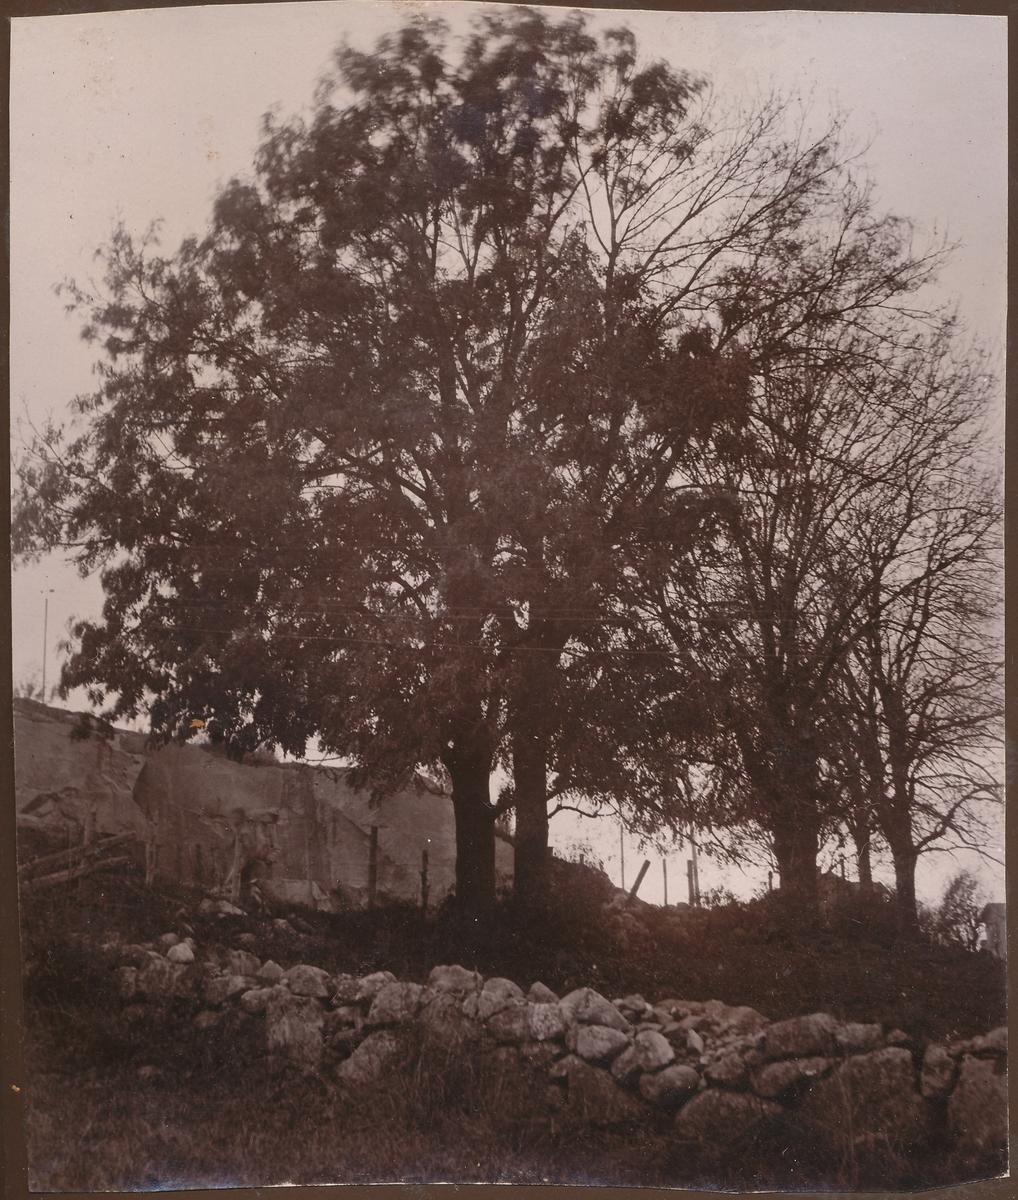 Løvtrær og stenmur